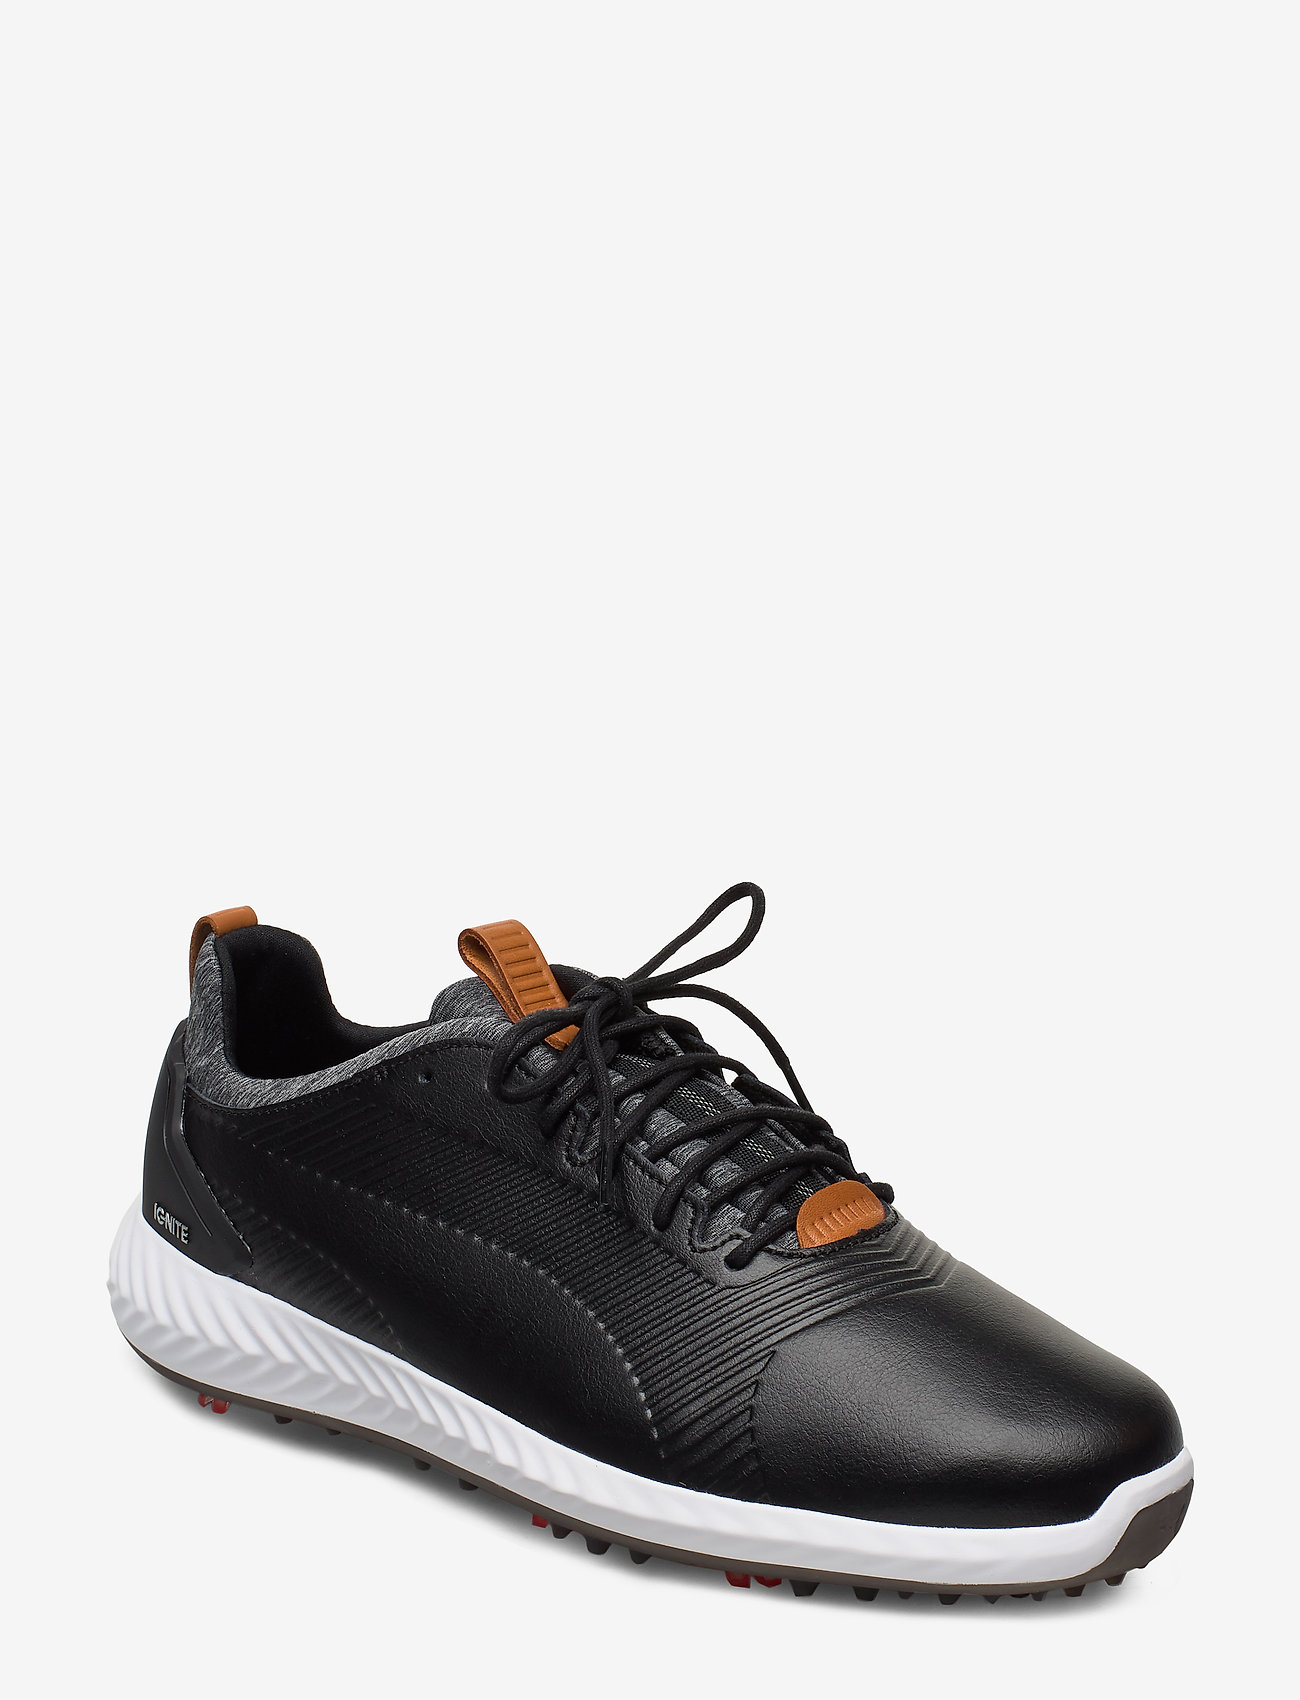 PUMA Golf - IGNITE PWRADAPT Leather 2.0 - golfschuhe - puma black-puma black - 0